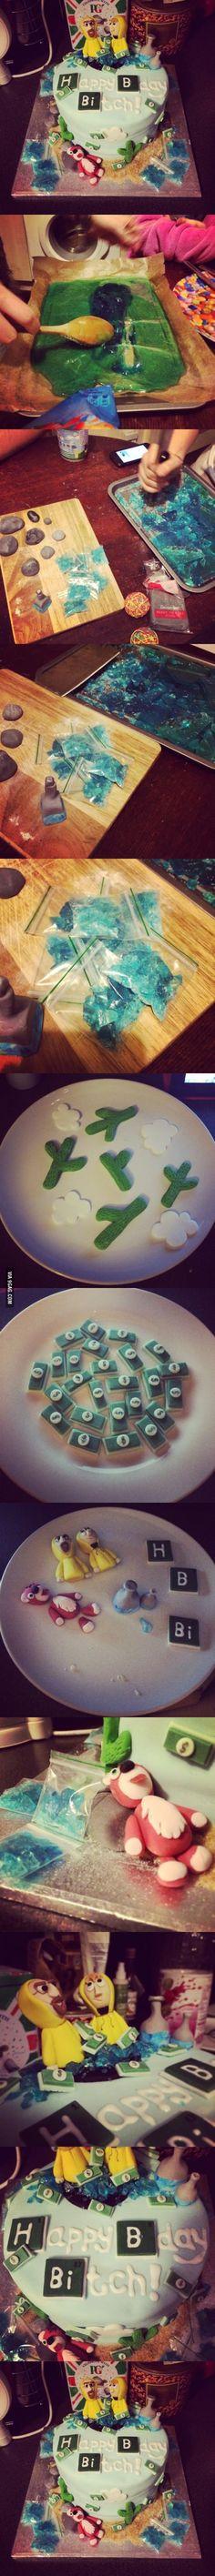 So my housemates made a cake...